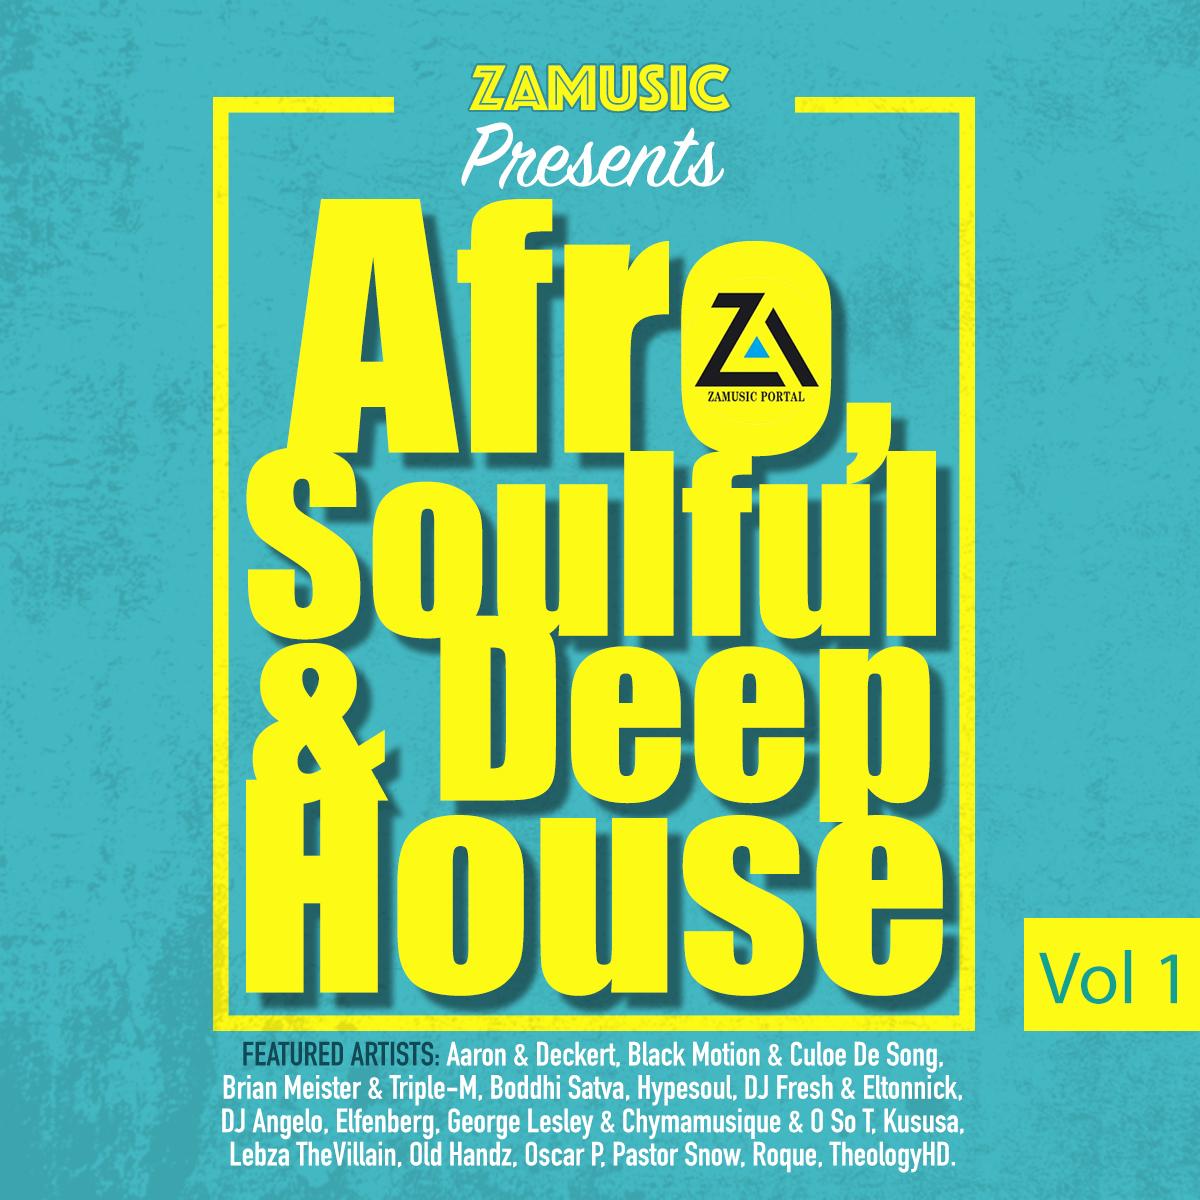 DOWNLOAD ALBUM: VA - Zamusic Presents Afro, Soulful & Deep